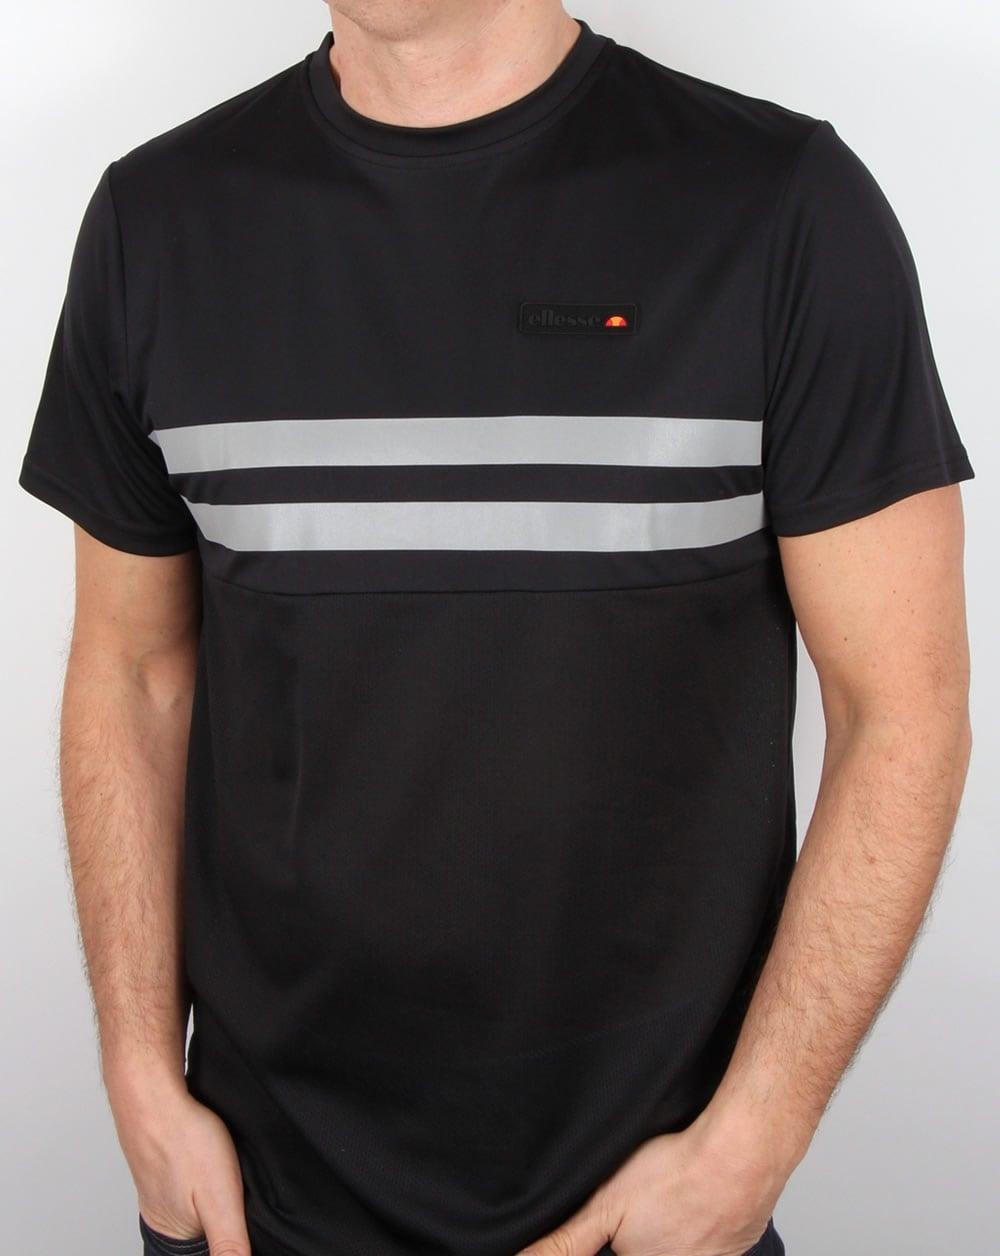 ellesse solar t shirt black tee crew neck performance mens. Black Bedroom Furniture Sets. Home Design Ideas